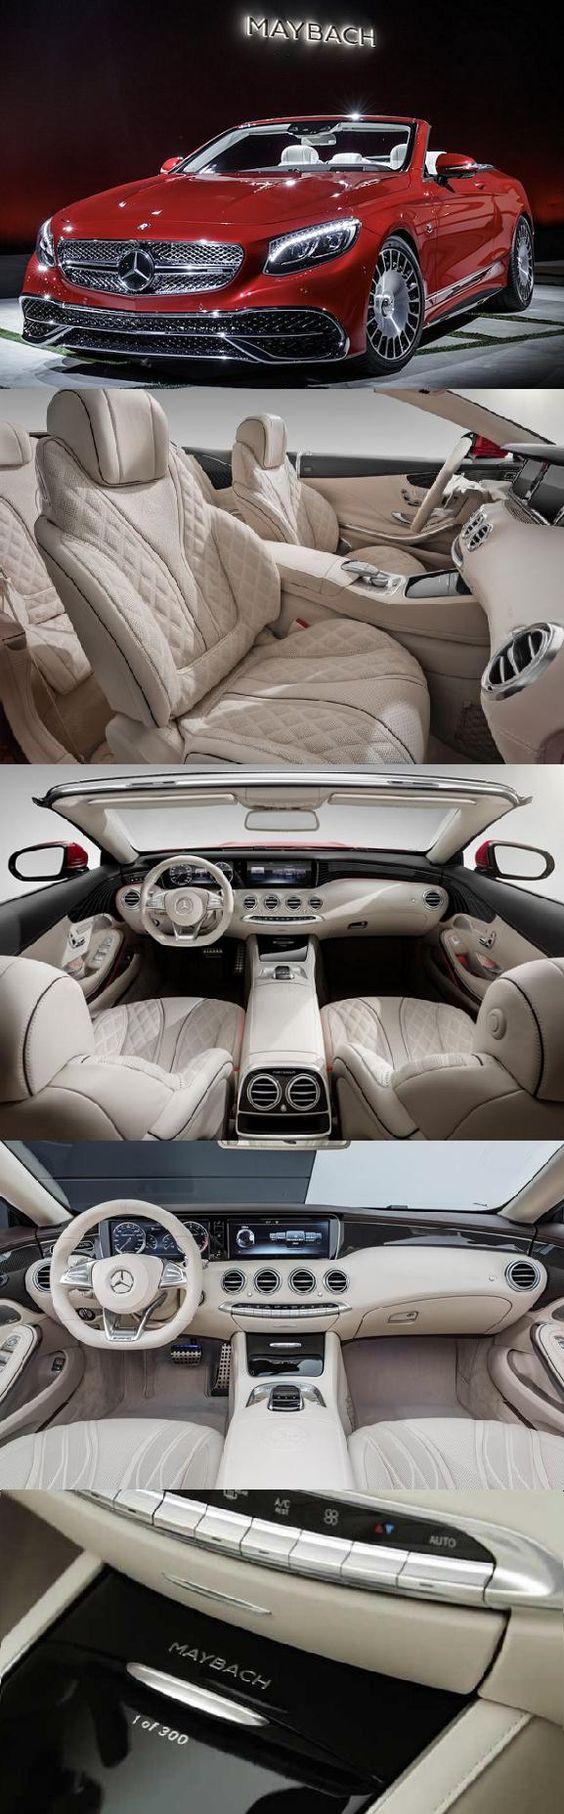 Best 25 mercedes car price ideas on pinterest mercedes benz price mercedes prices and concept cars